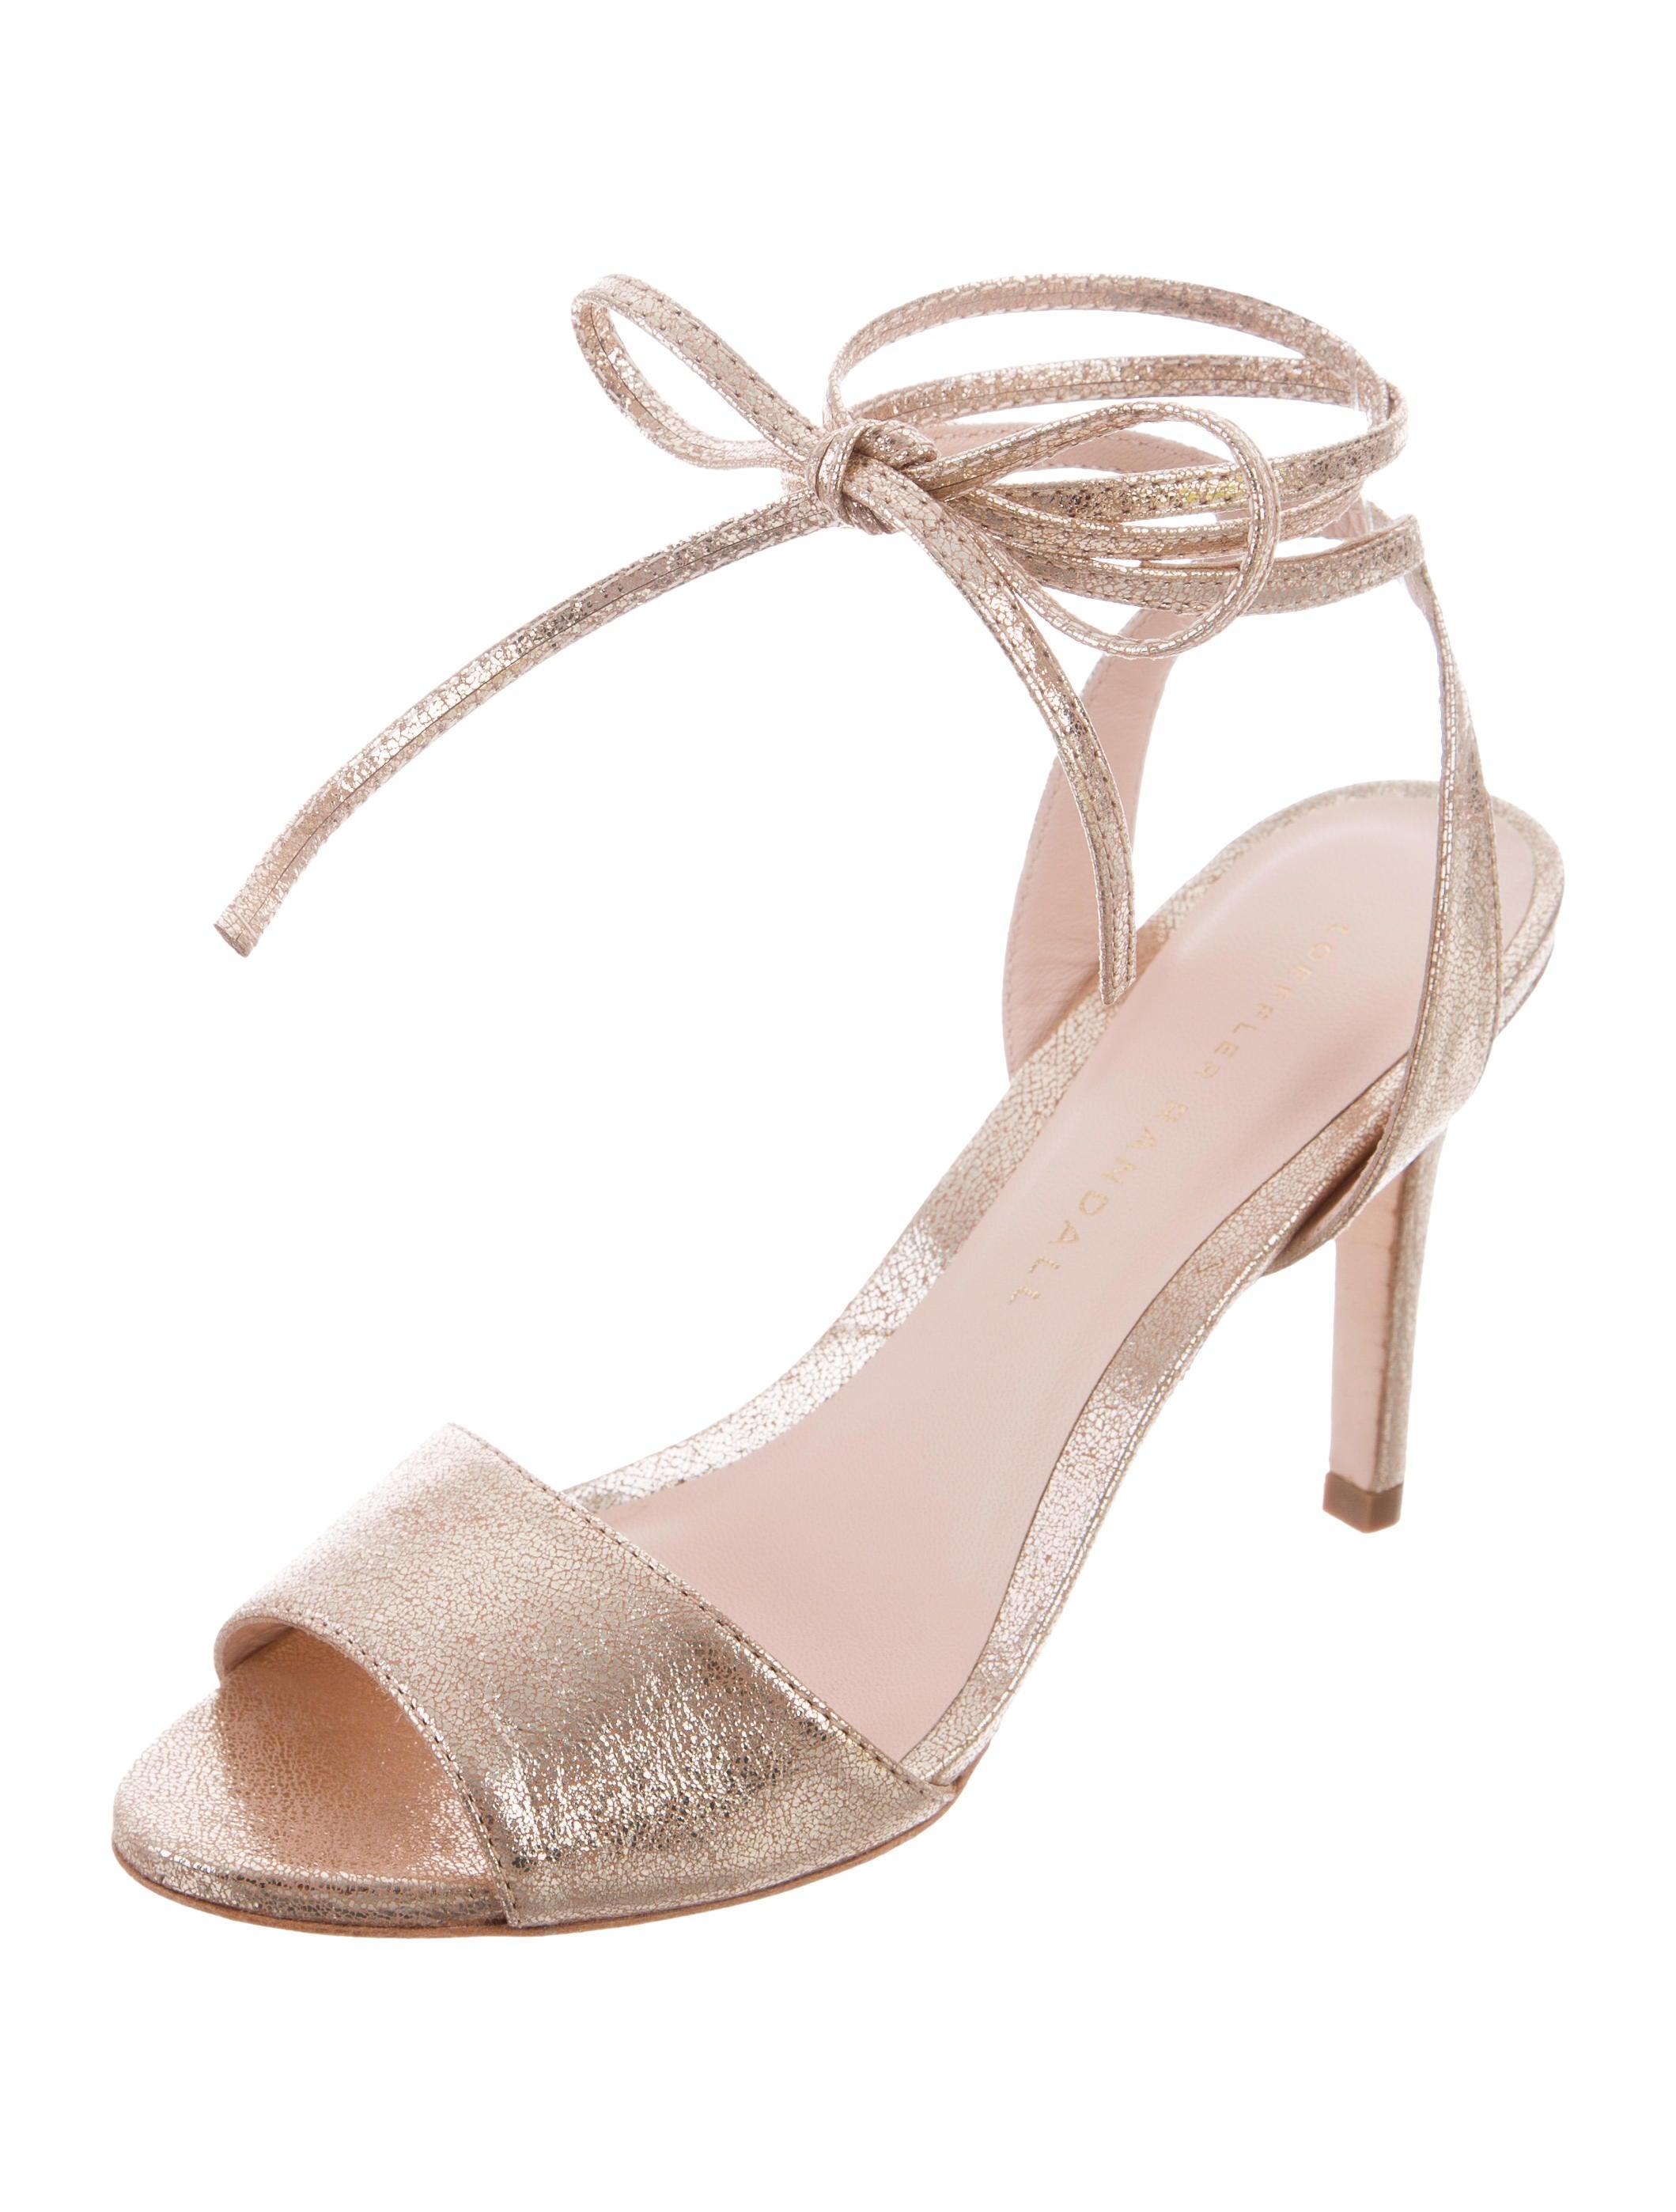 Loeffler Randall Metallic Elyse Sandals w/ Tags clearance view low price fee shipping cheap online JoLvQKckp